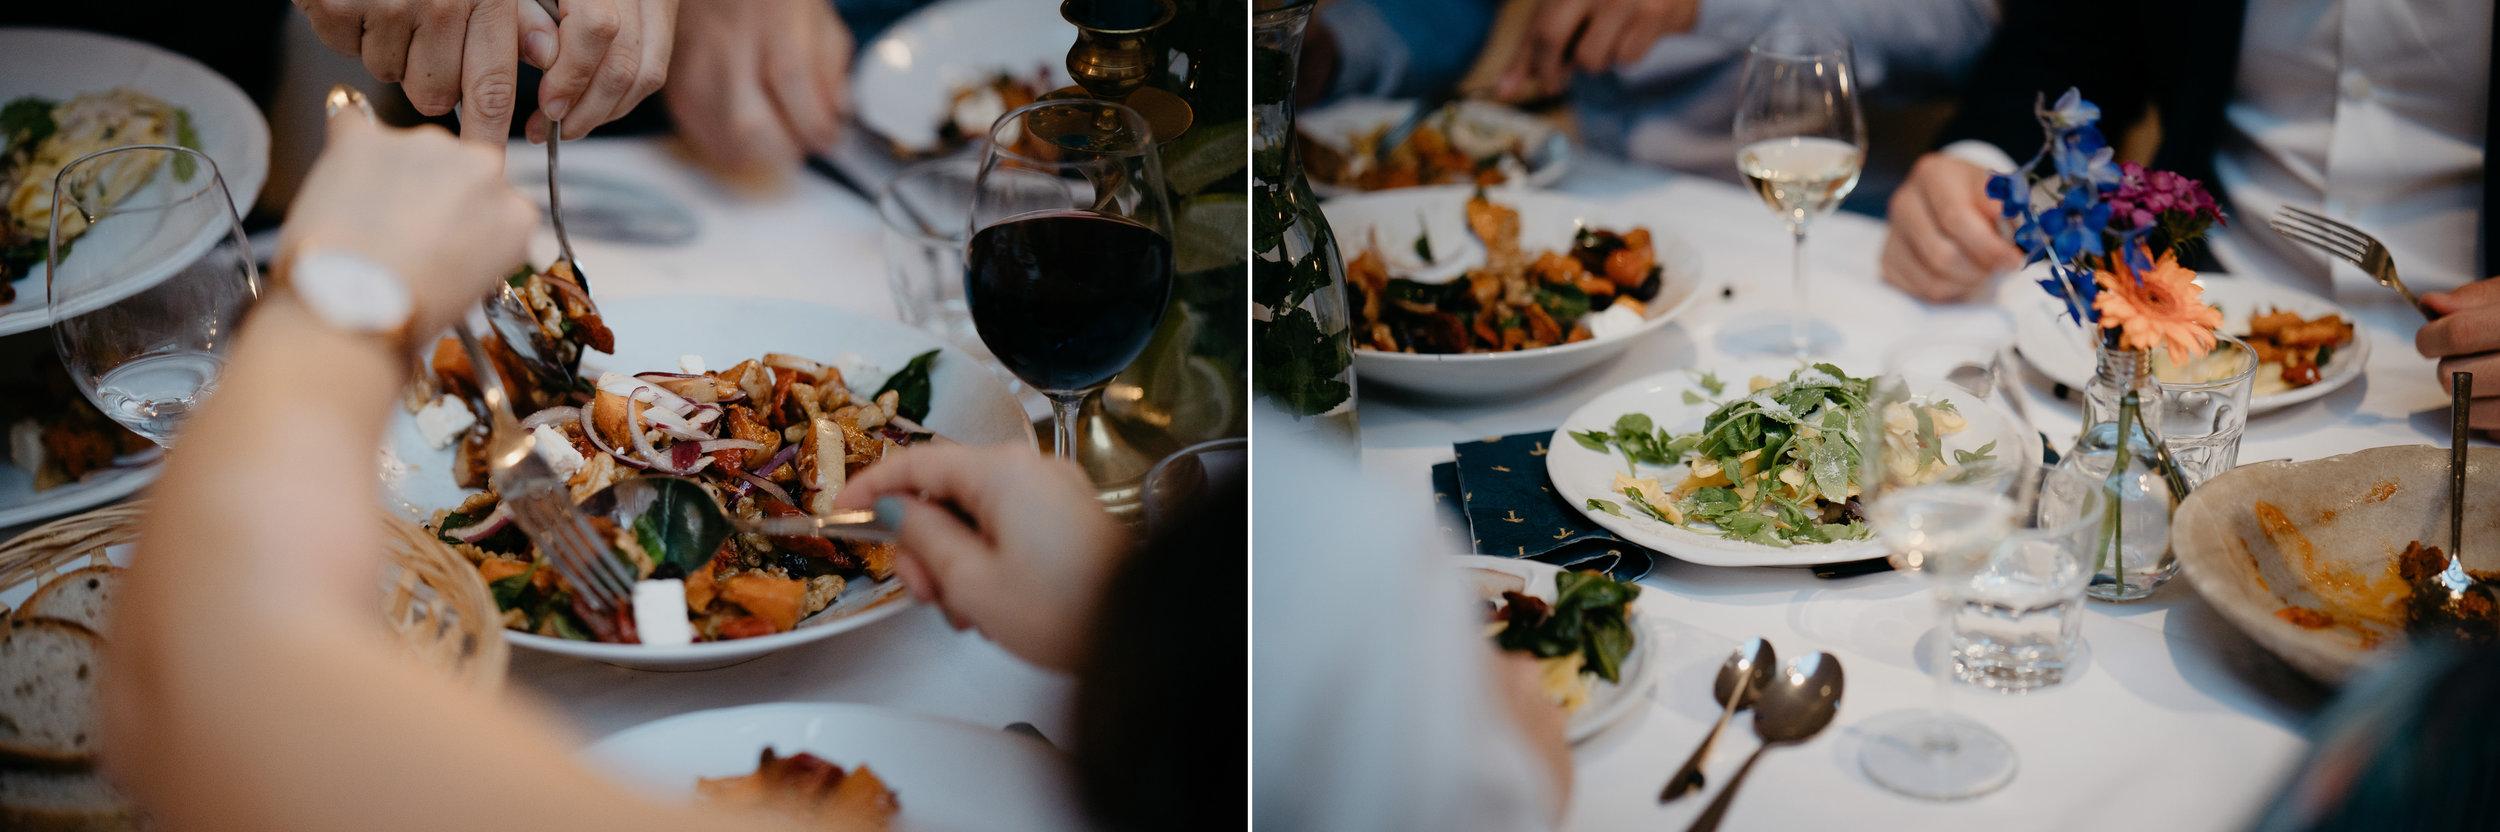 wedding dinner during a lovely wedding in amsterdam wedding photographer mark hadden